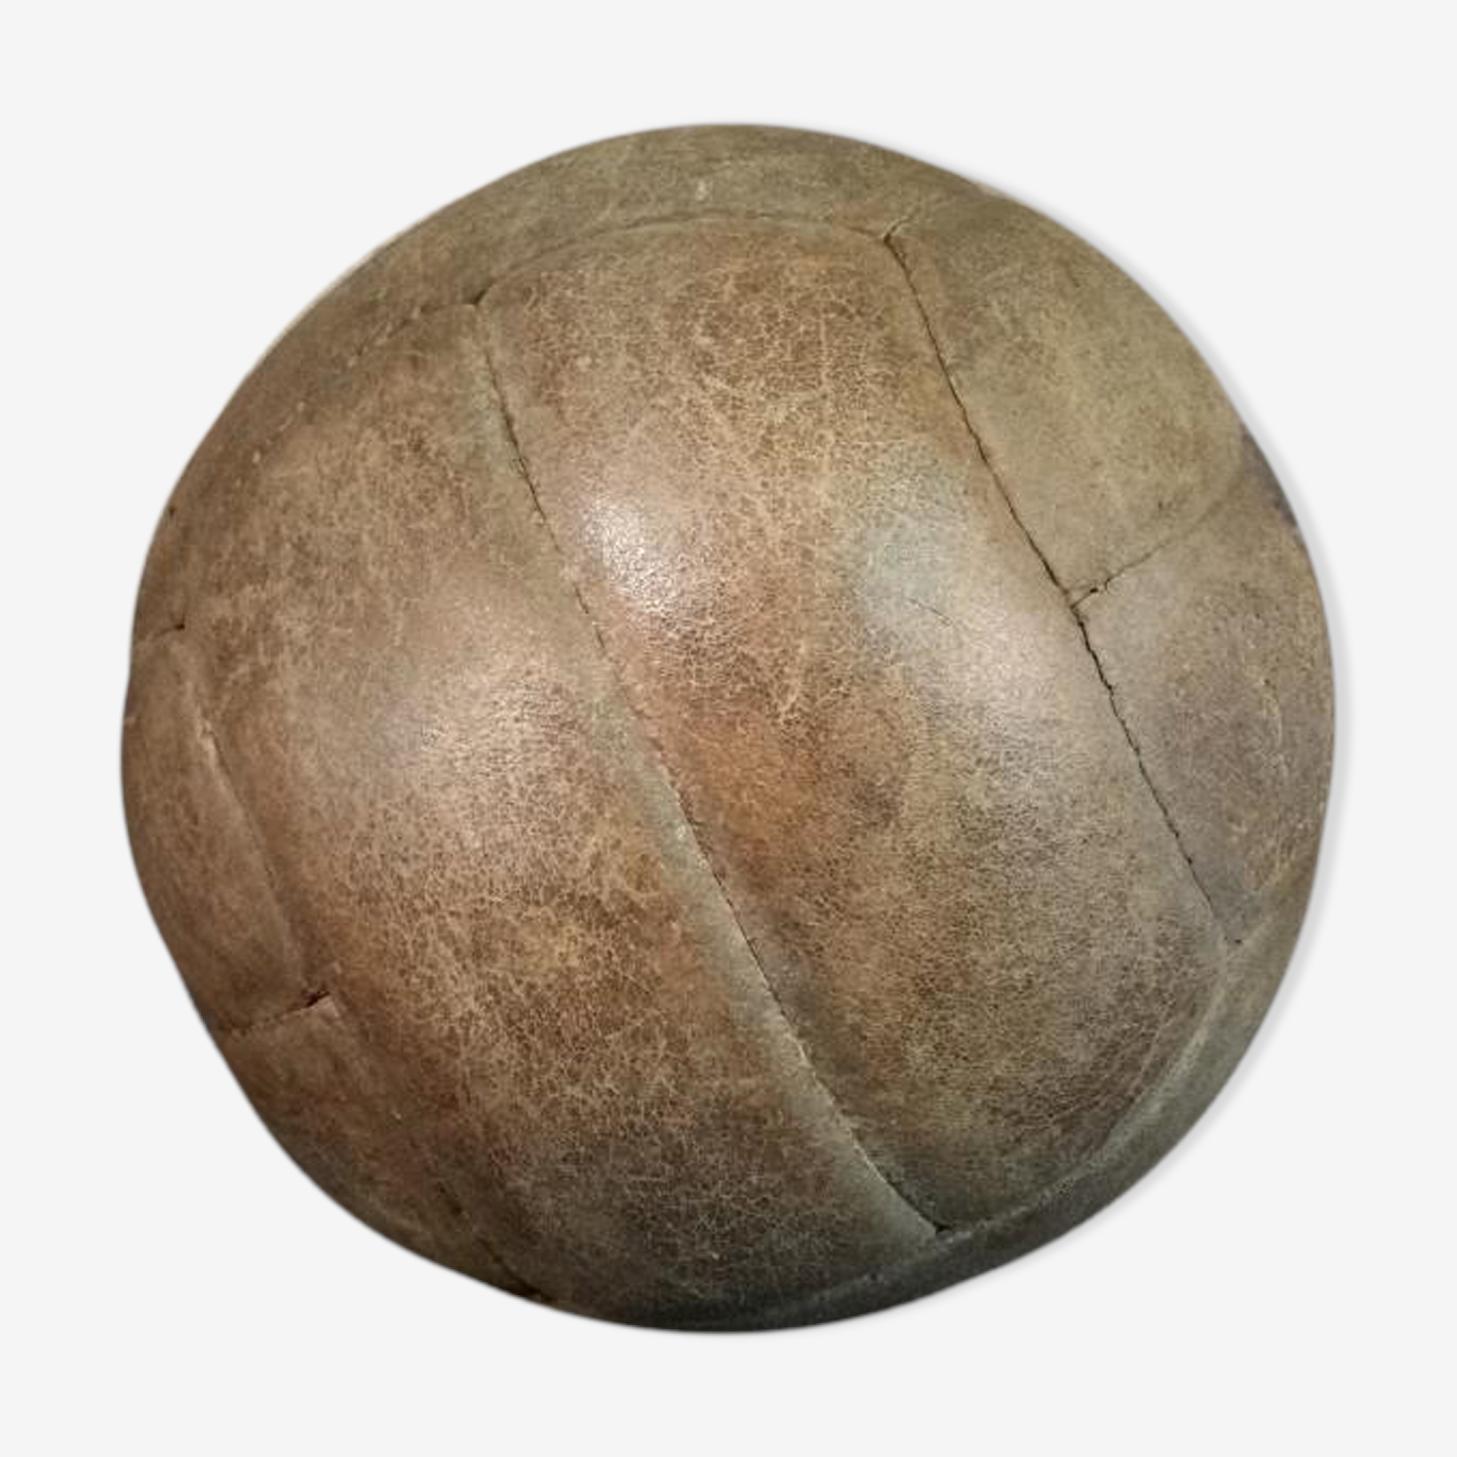 Sport vintage ball